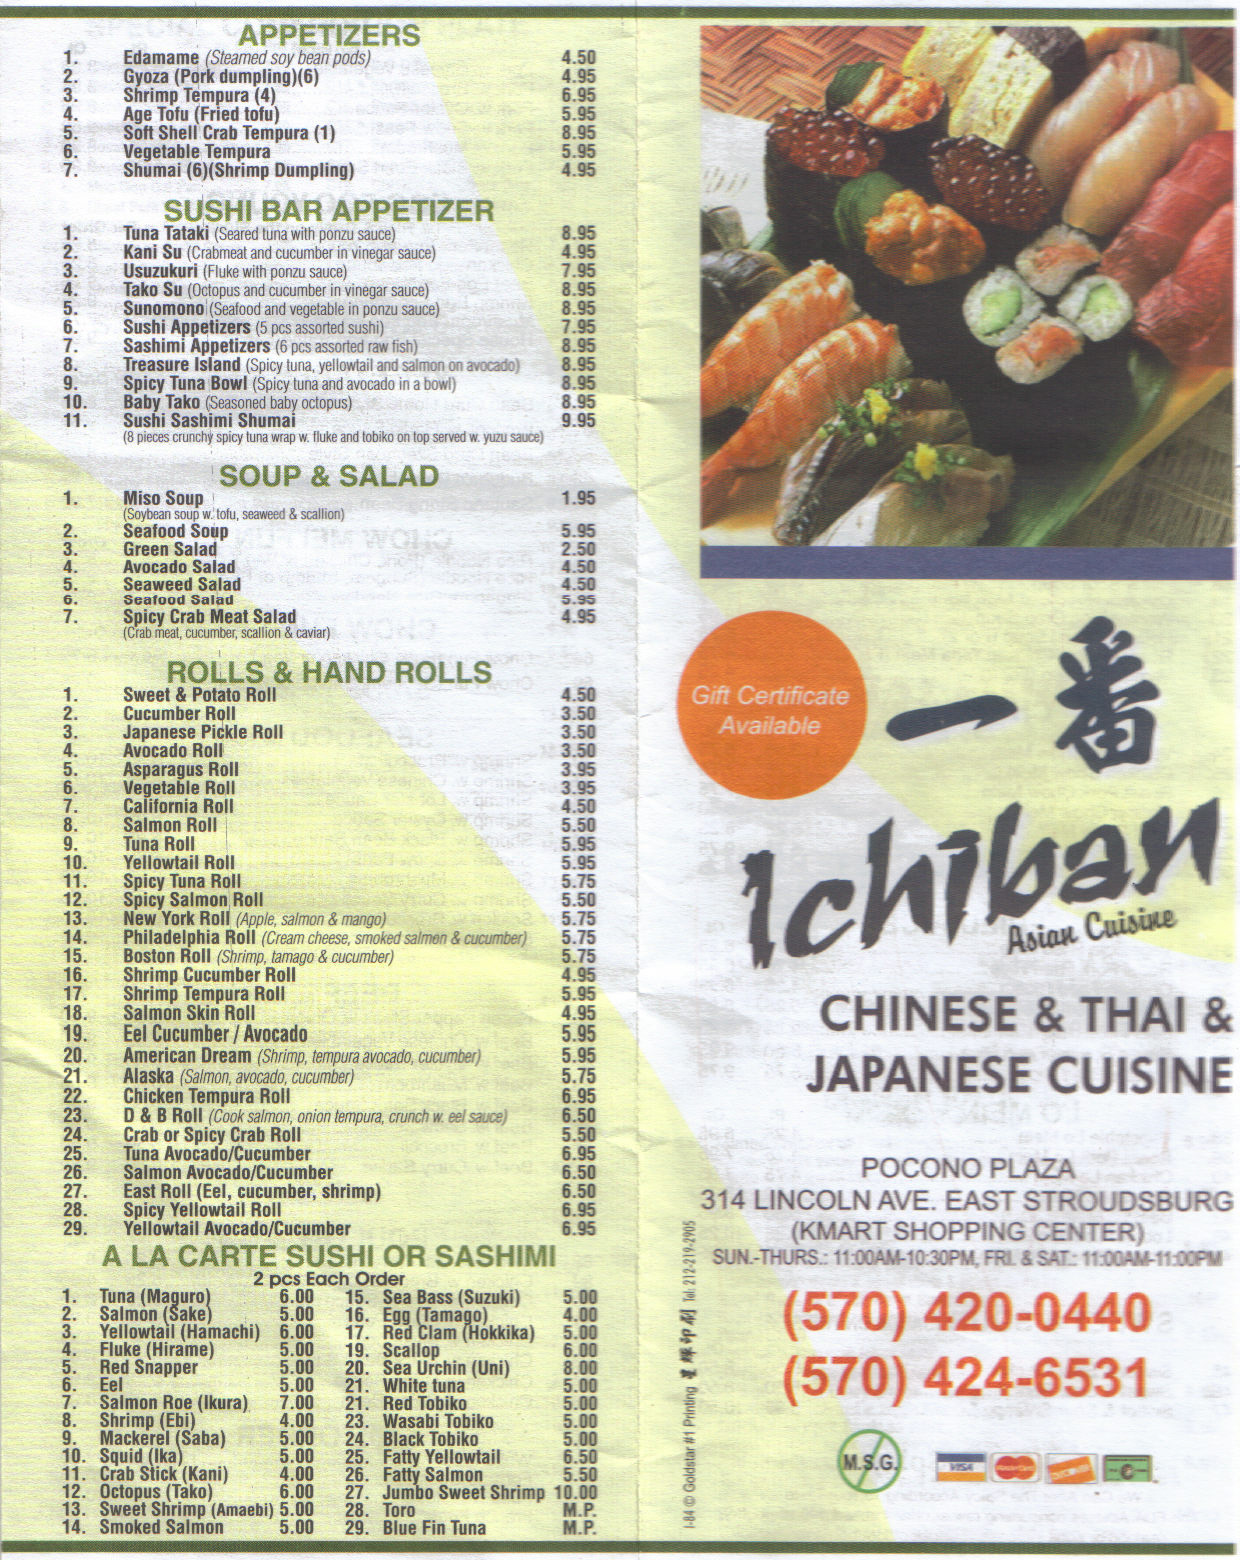 Ichiban menu for Asian cuisine catering